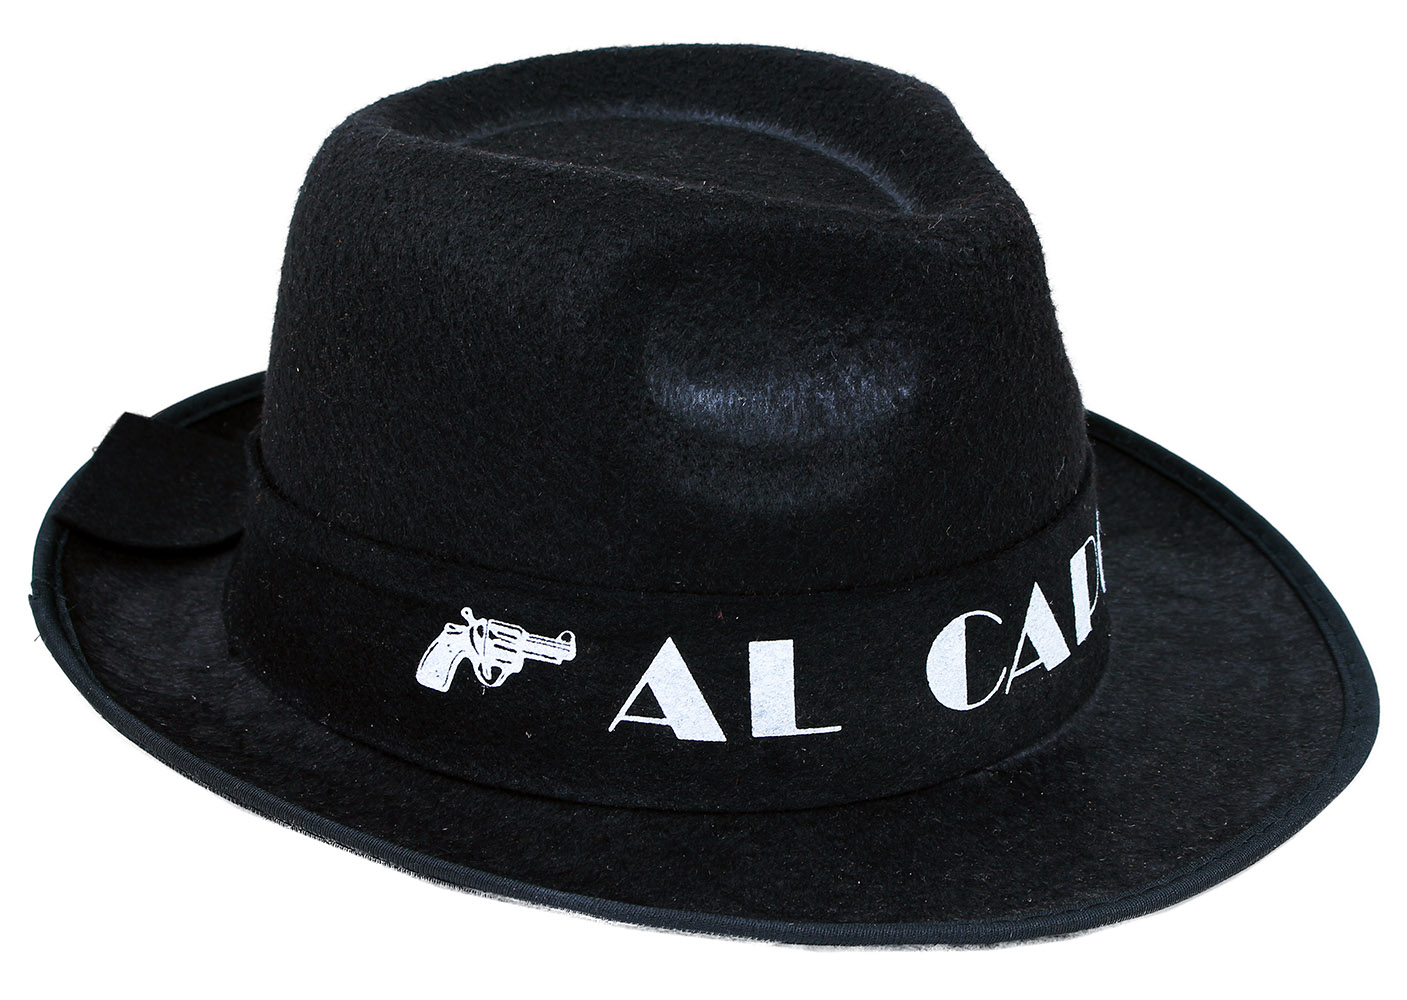 Klobouk Al Capone pro dospělé